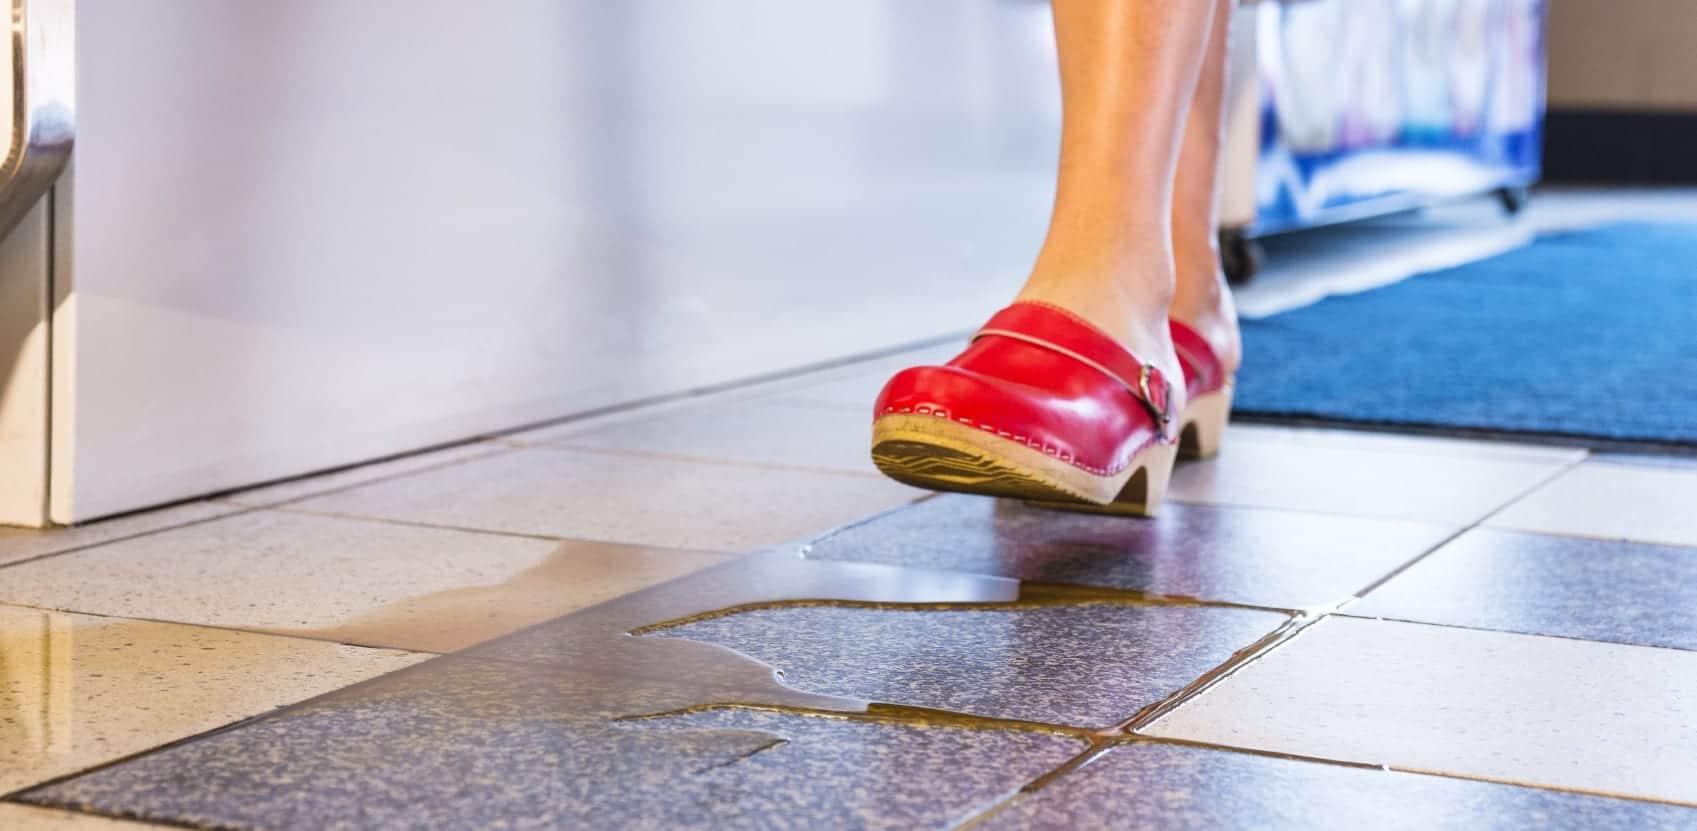 Woman Walking On Wet Floor Stock Photo